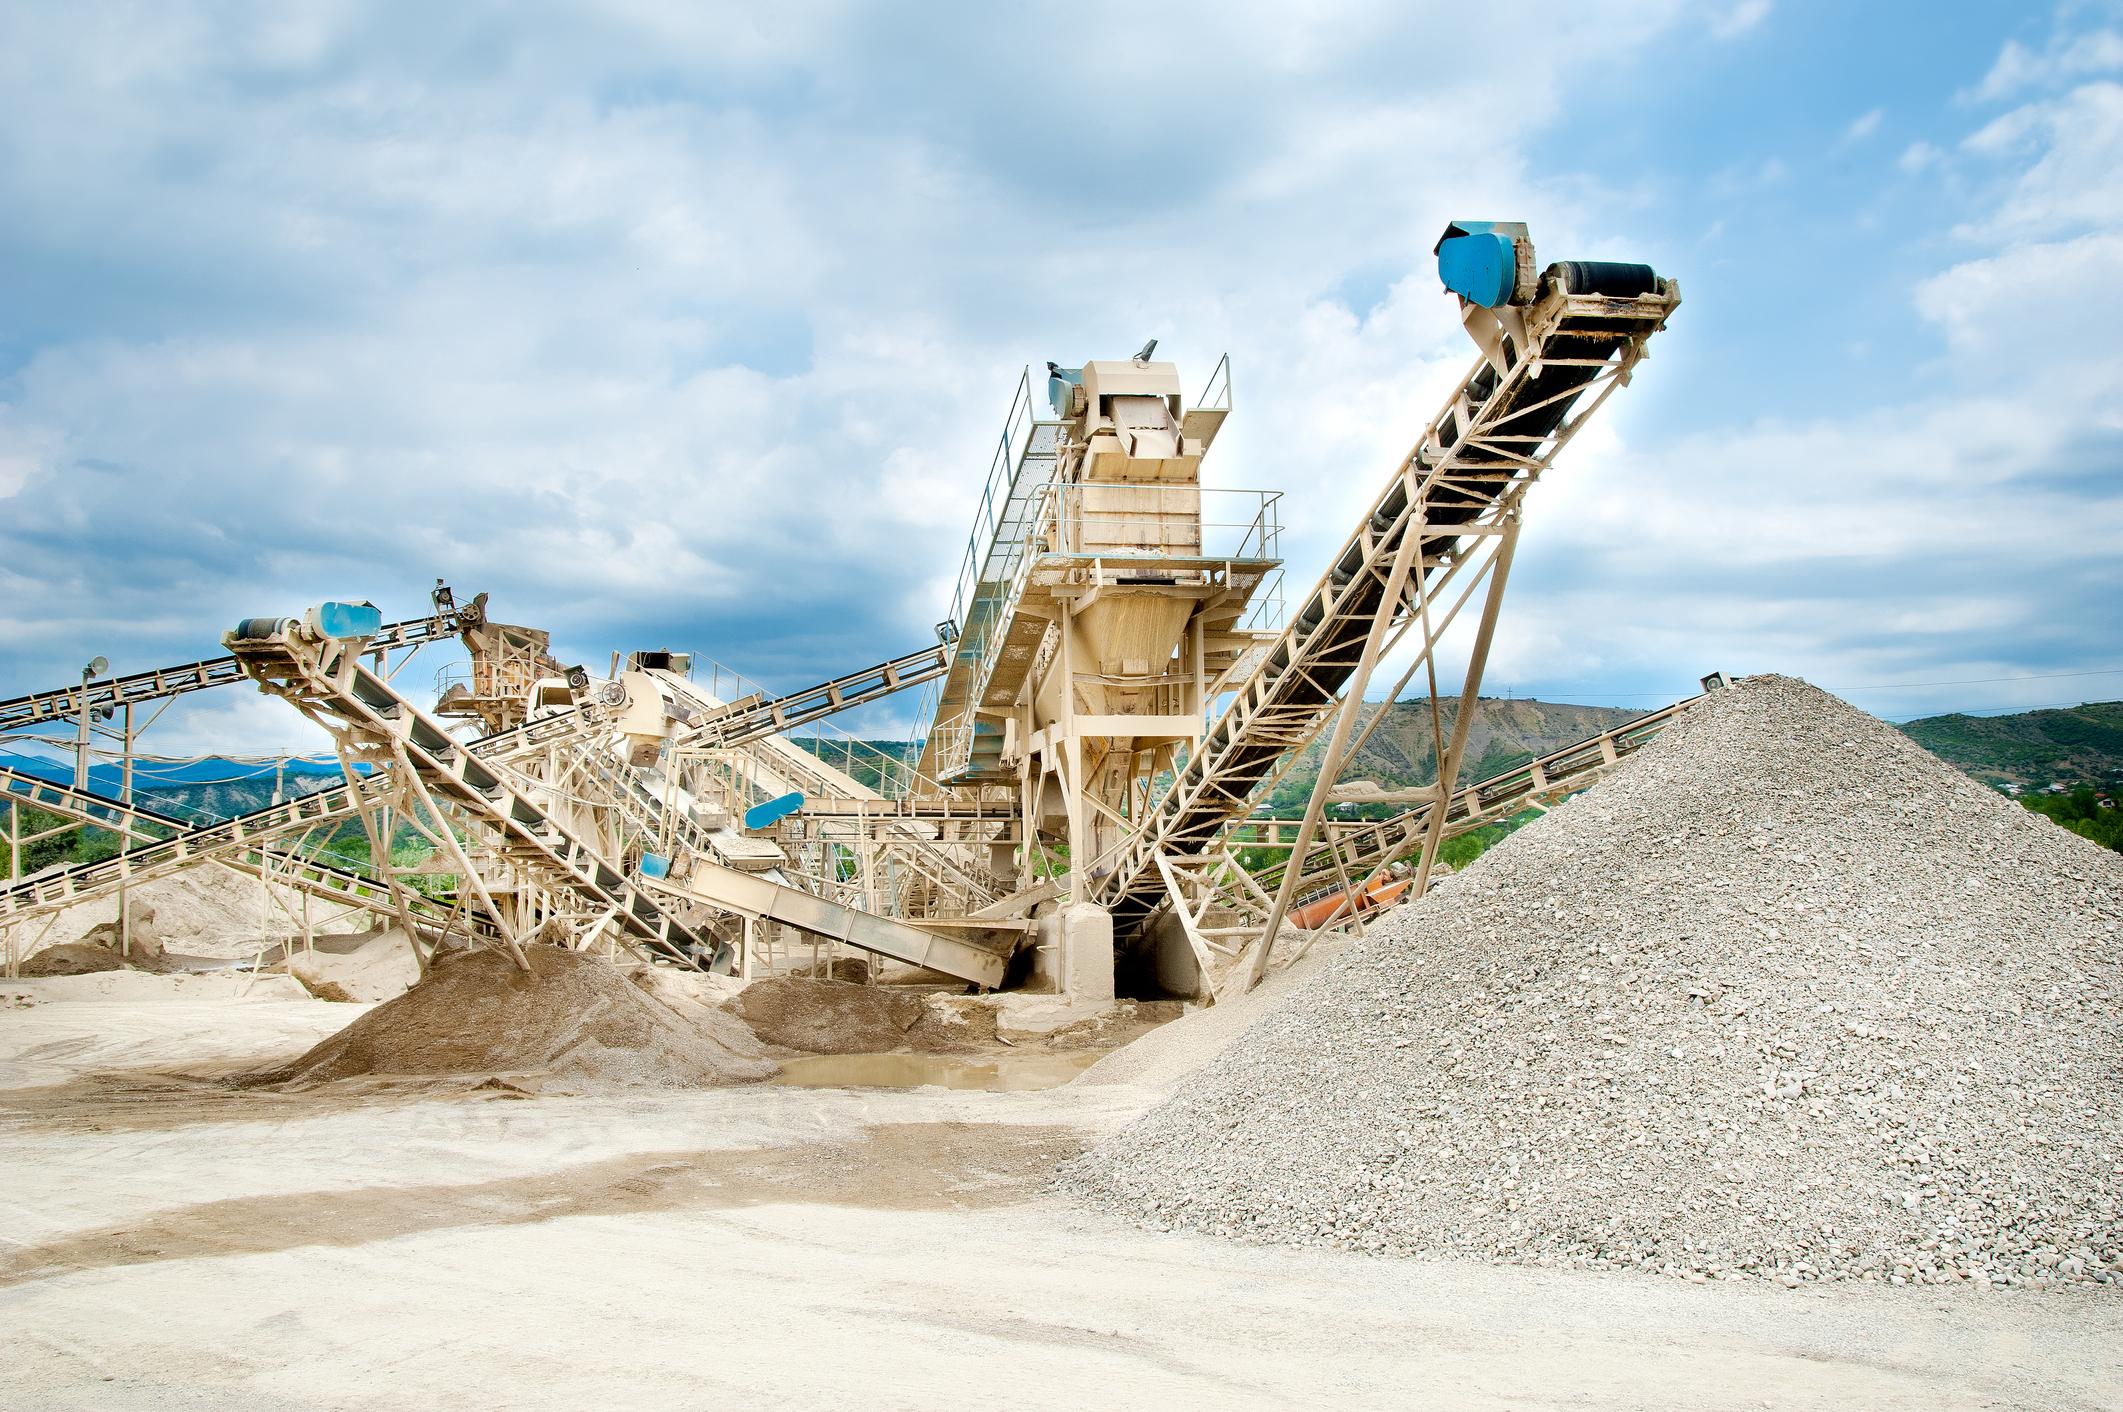 Sand pit equipment